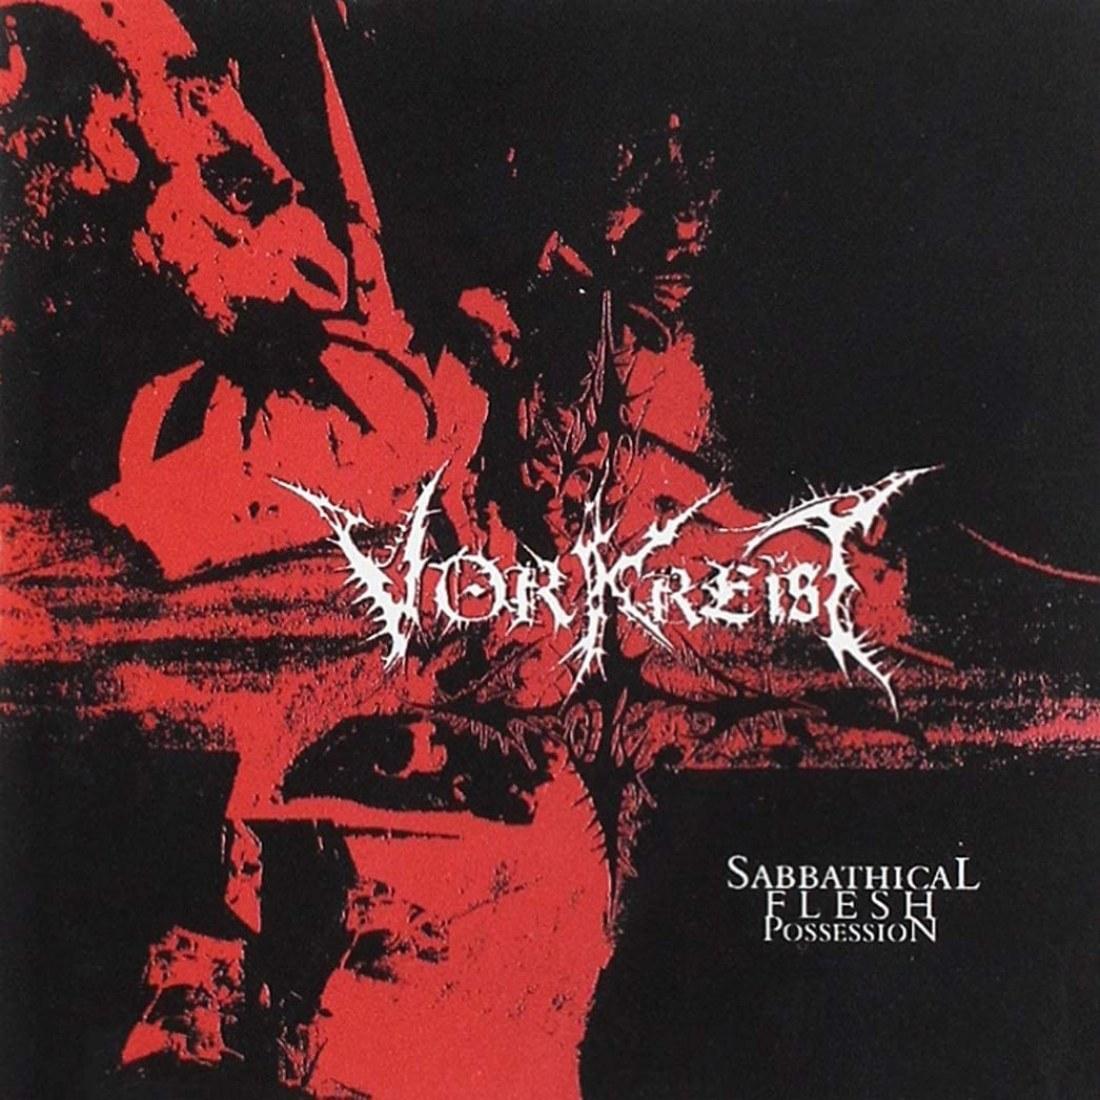 Review for Vorkreist - Sabbathical Flesh Possession